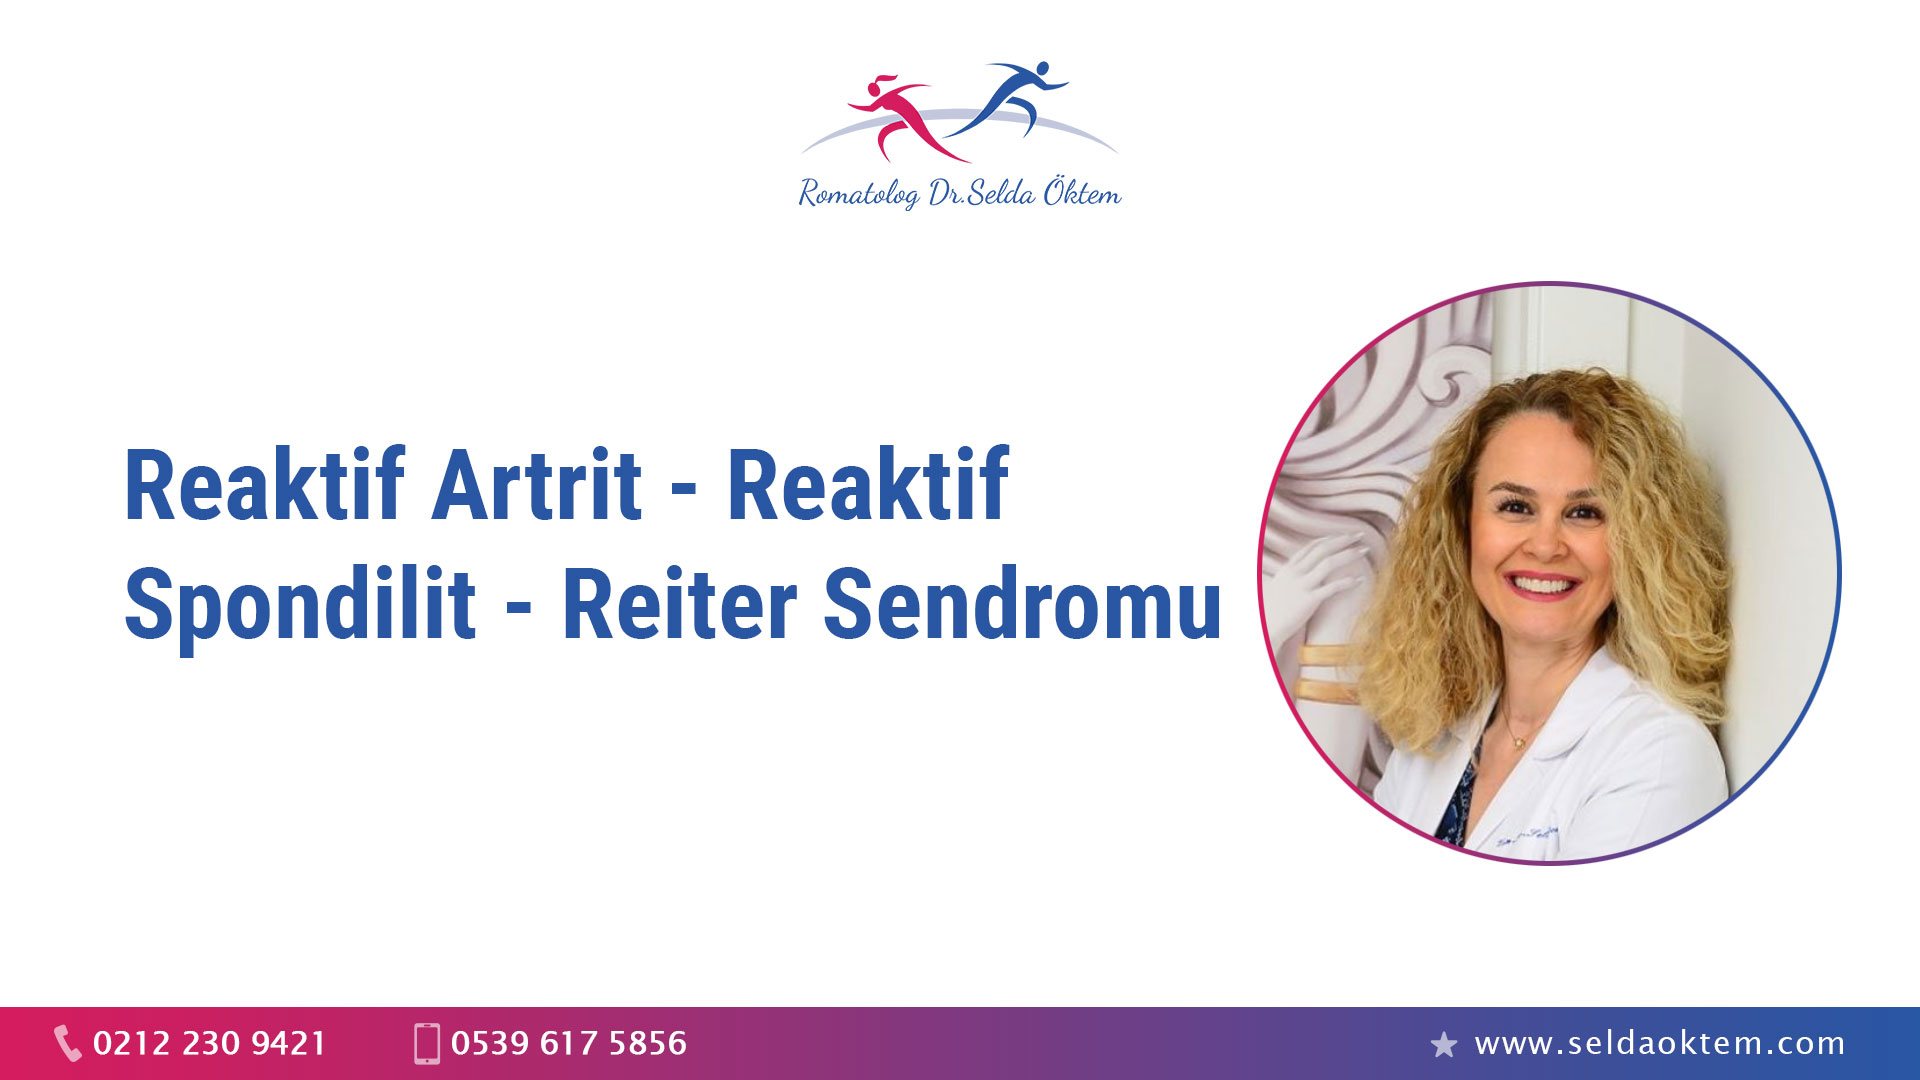 Reaktif Artrit - Reaktif Spondilit - Reiter Sendromu